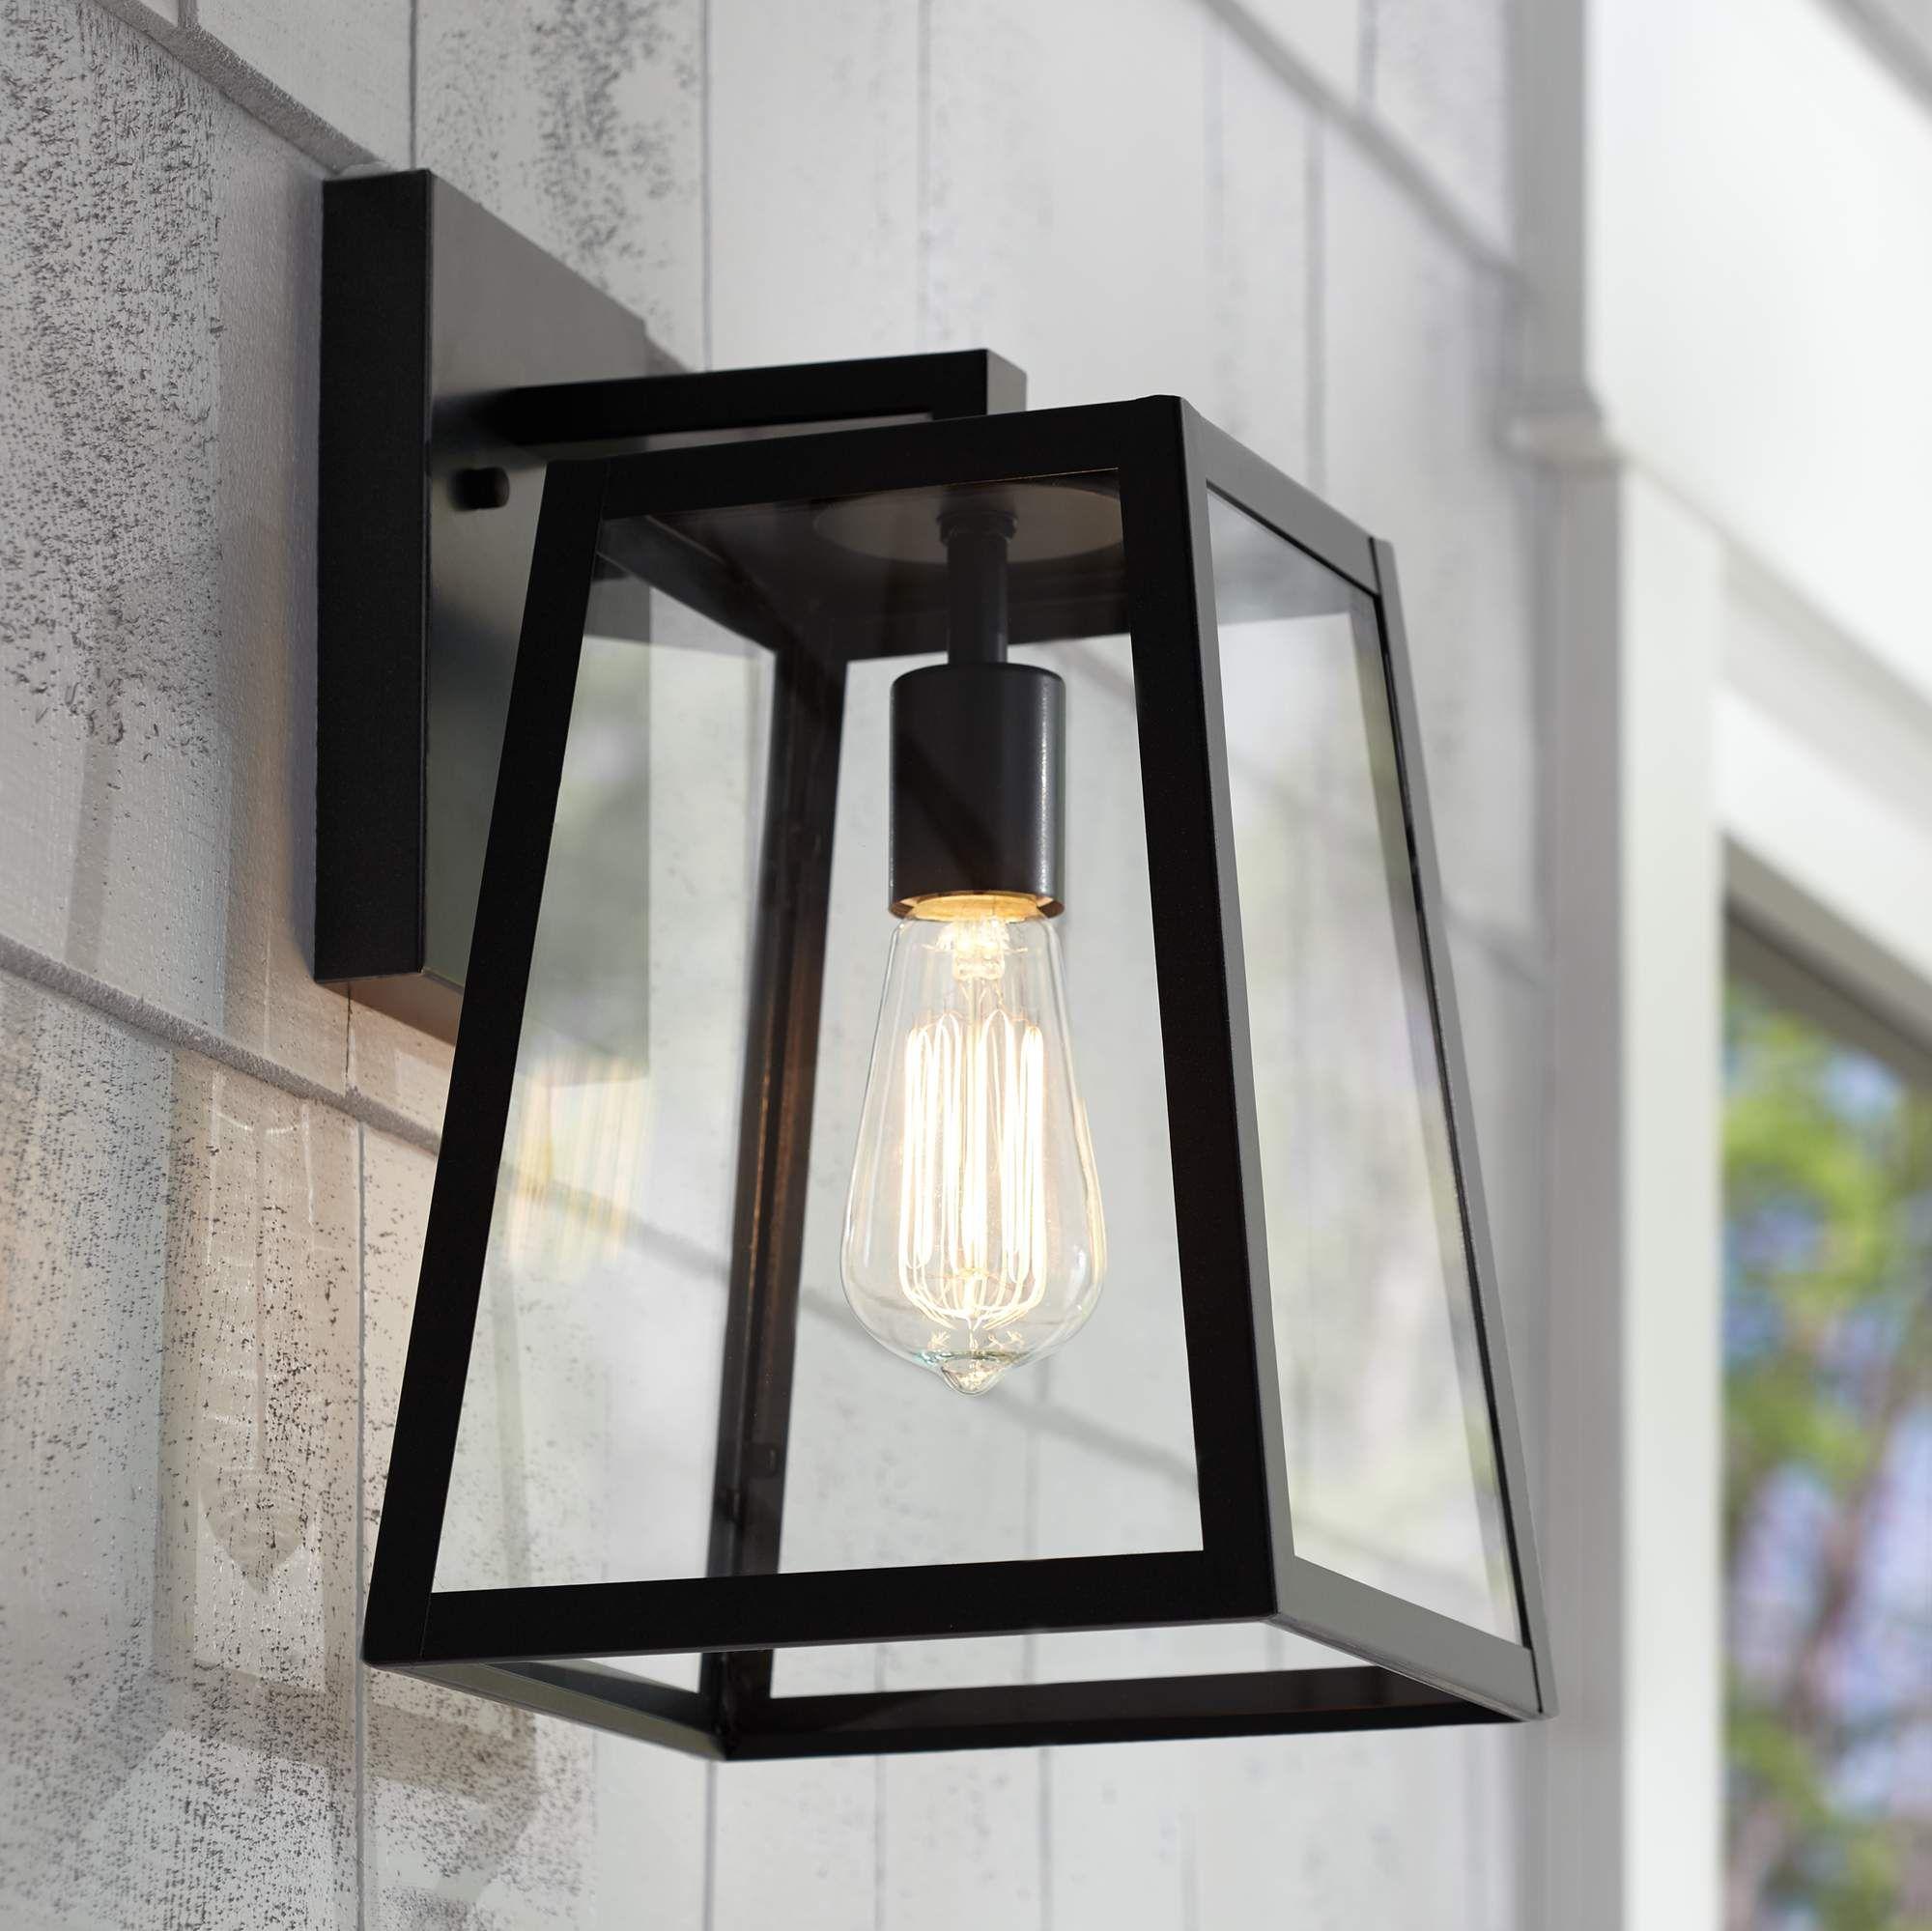 Arrington 13 High Mystic Black Outdoor Wall Light Outdoor walls